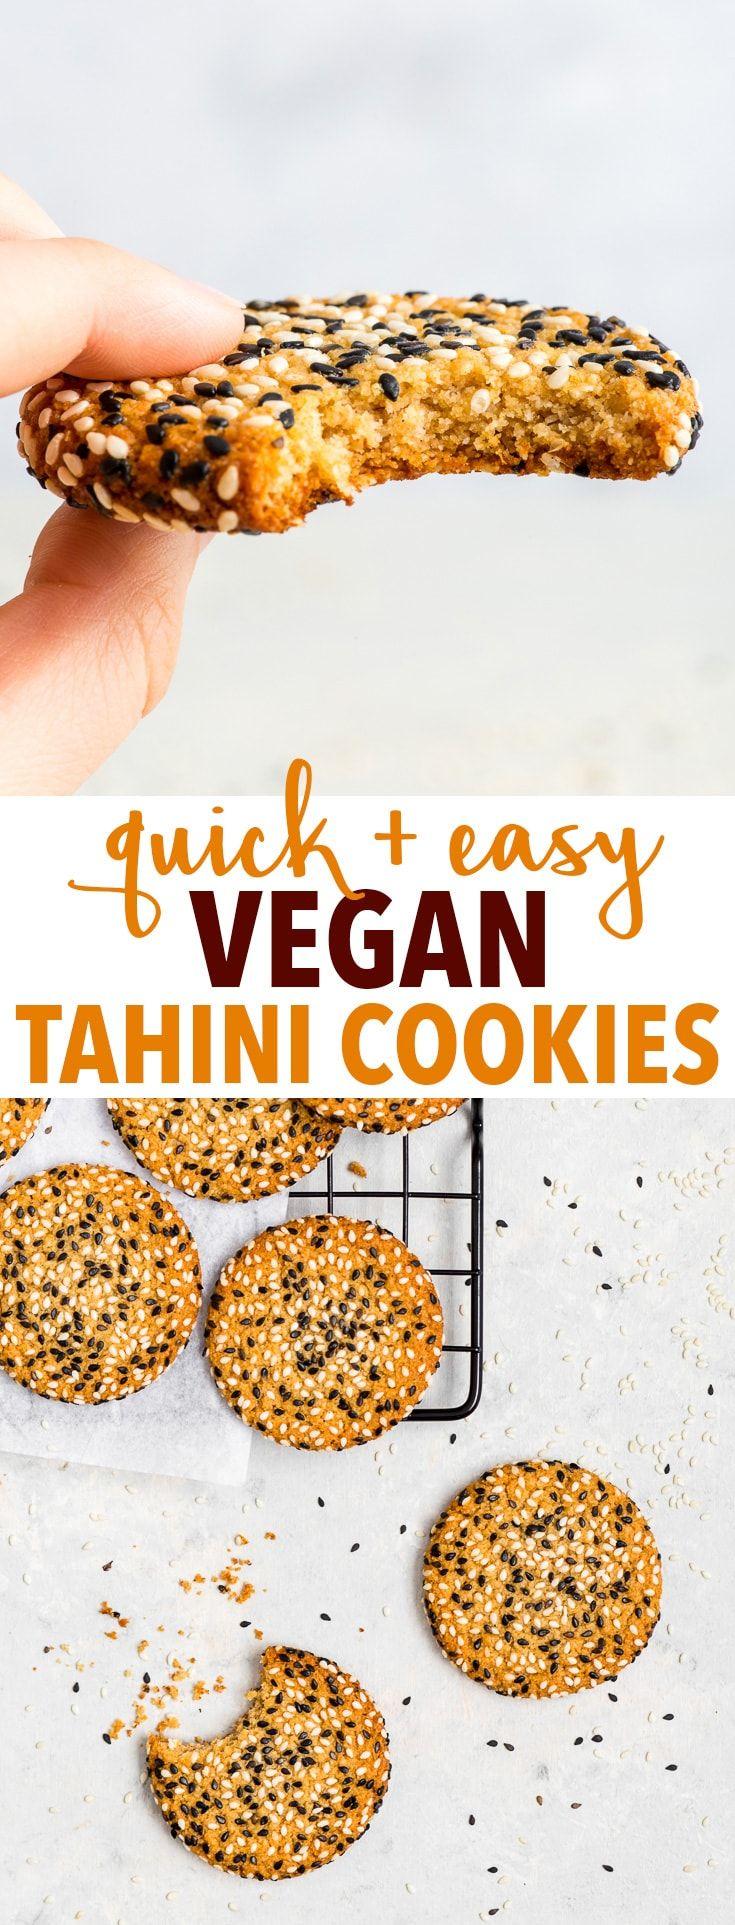 Quick + Easy Vegan Tahini Cookies (Gluten Free, Dairy Free, Vegan, Paleo) - Si y ...